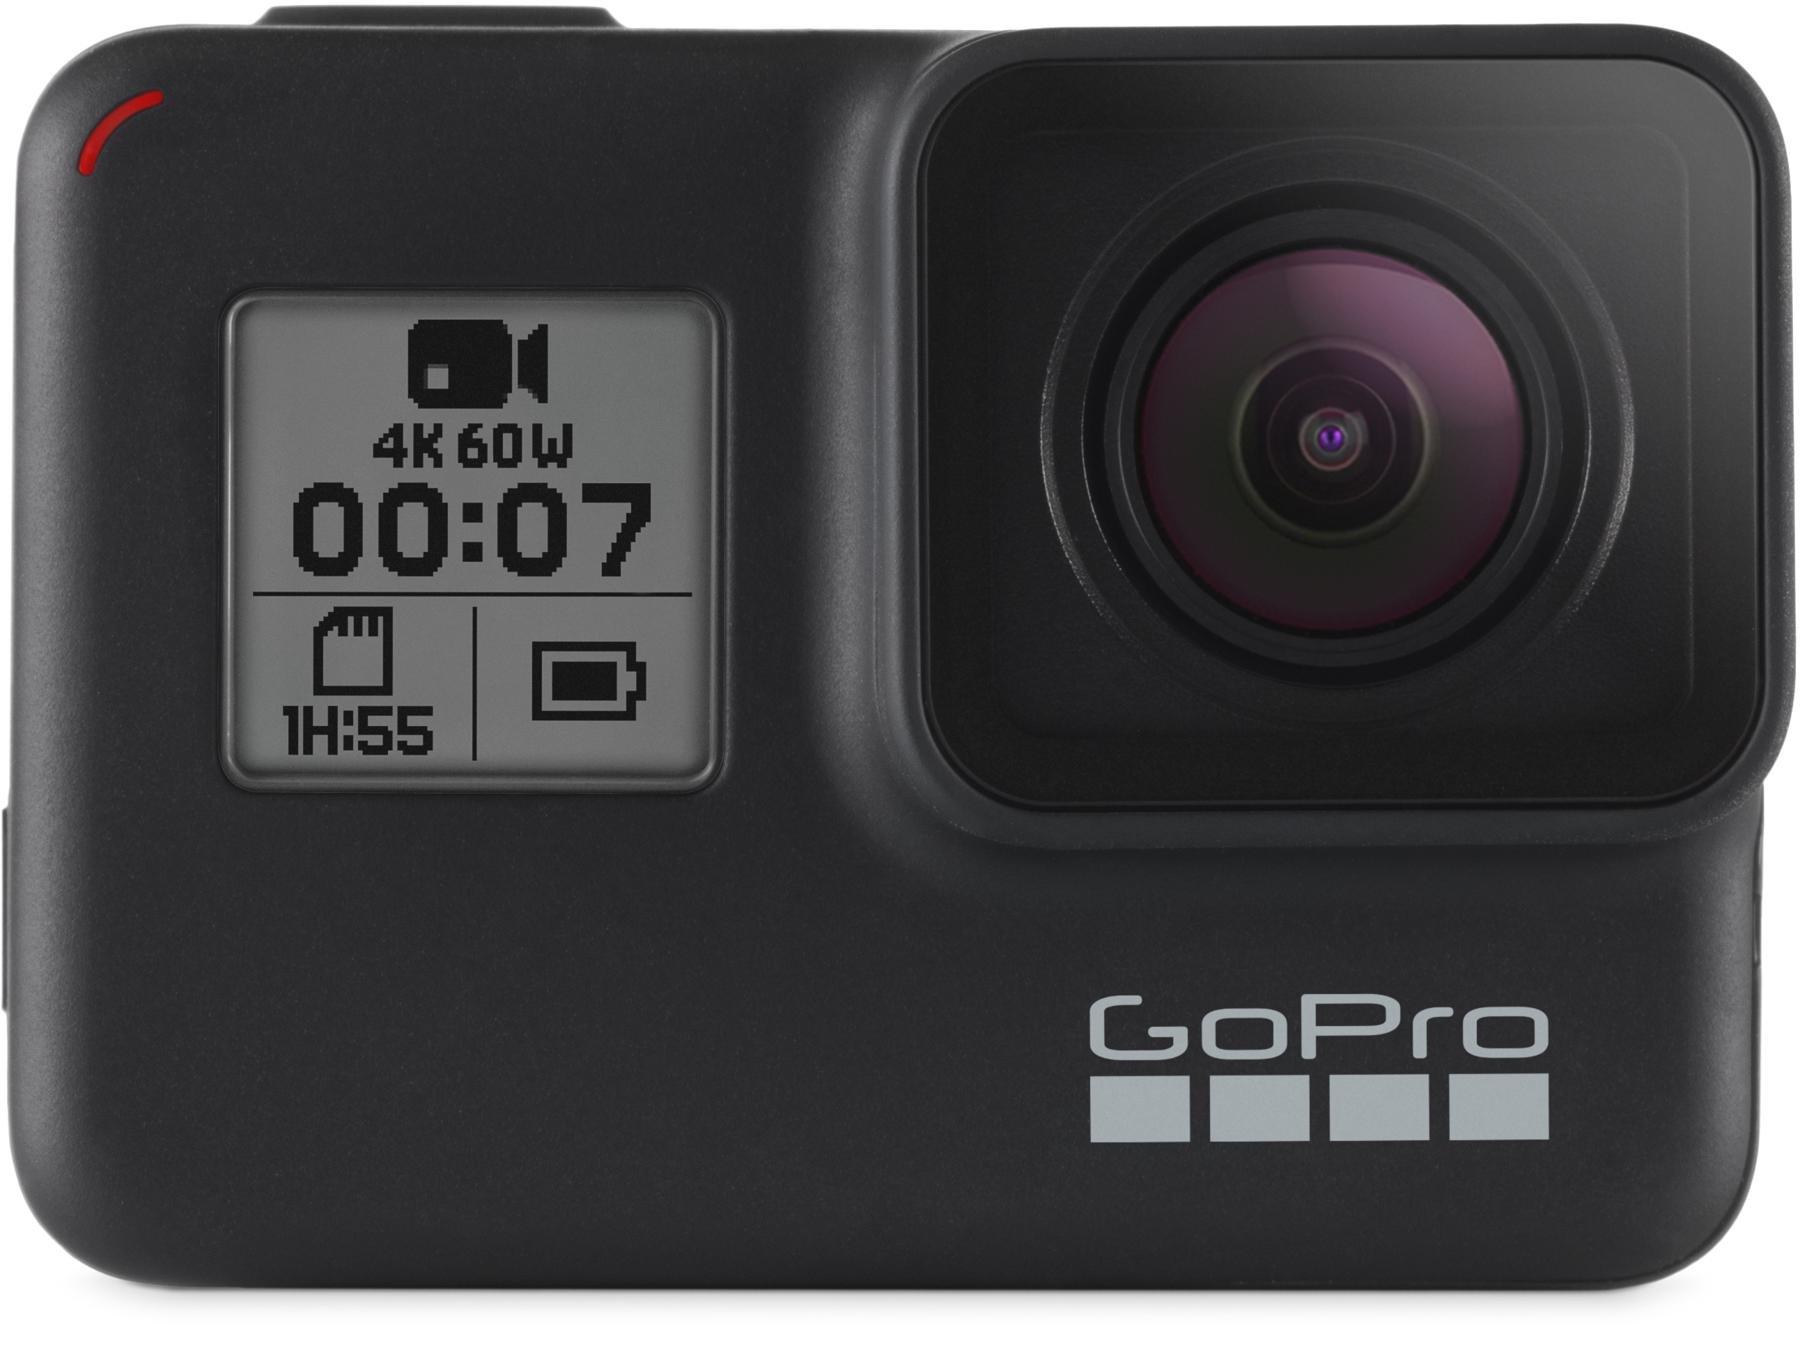 Gopro Hero7 Black 4k60 Waterproof Action Camera Sweetwater Hero5 Free Acc Shorty Image 1